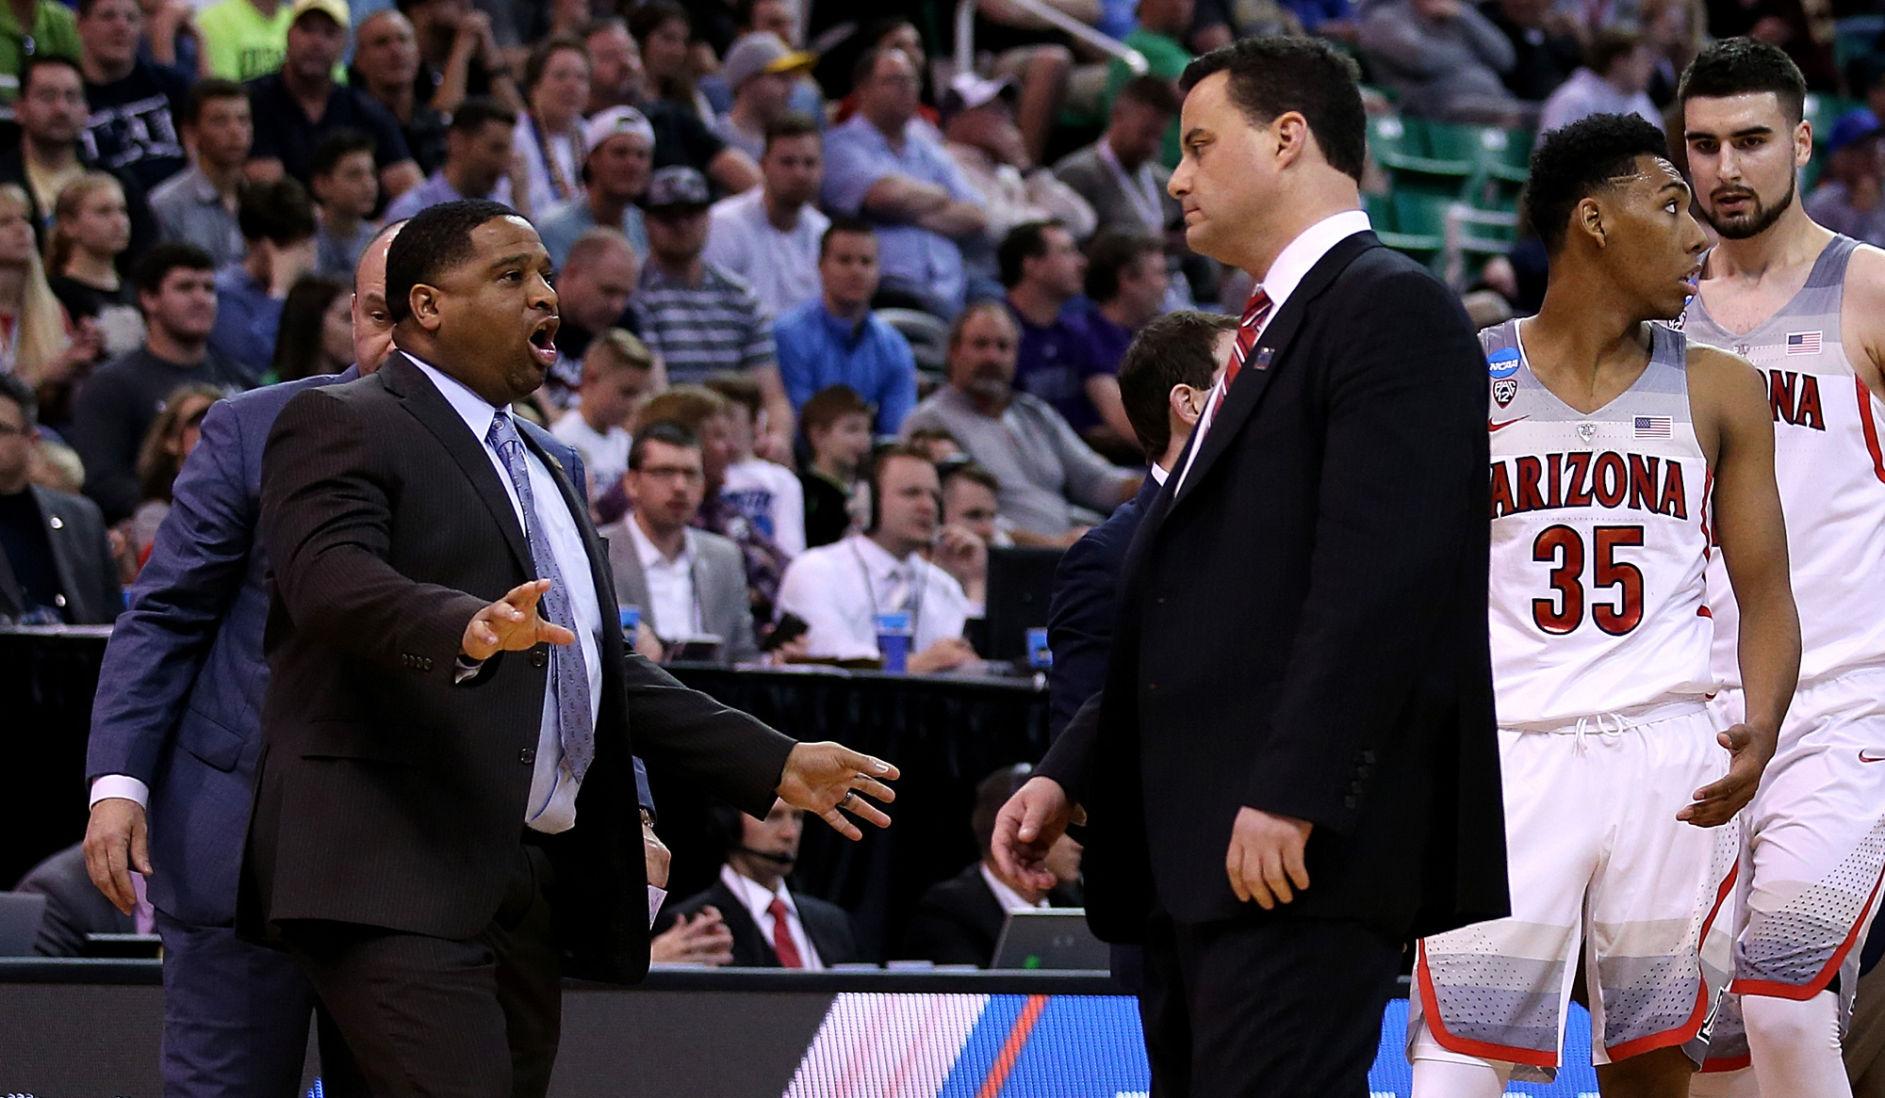 UA head coach Sean Miller speaks out on NCAA scandal